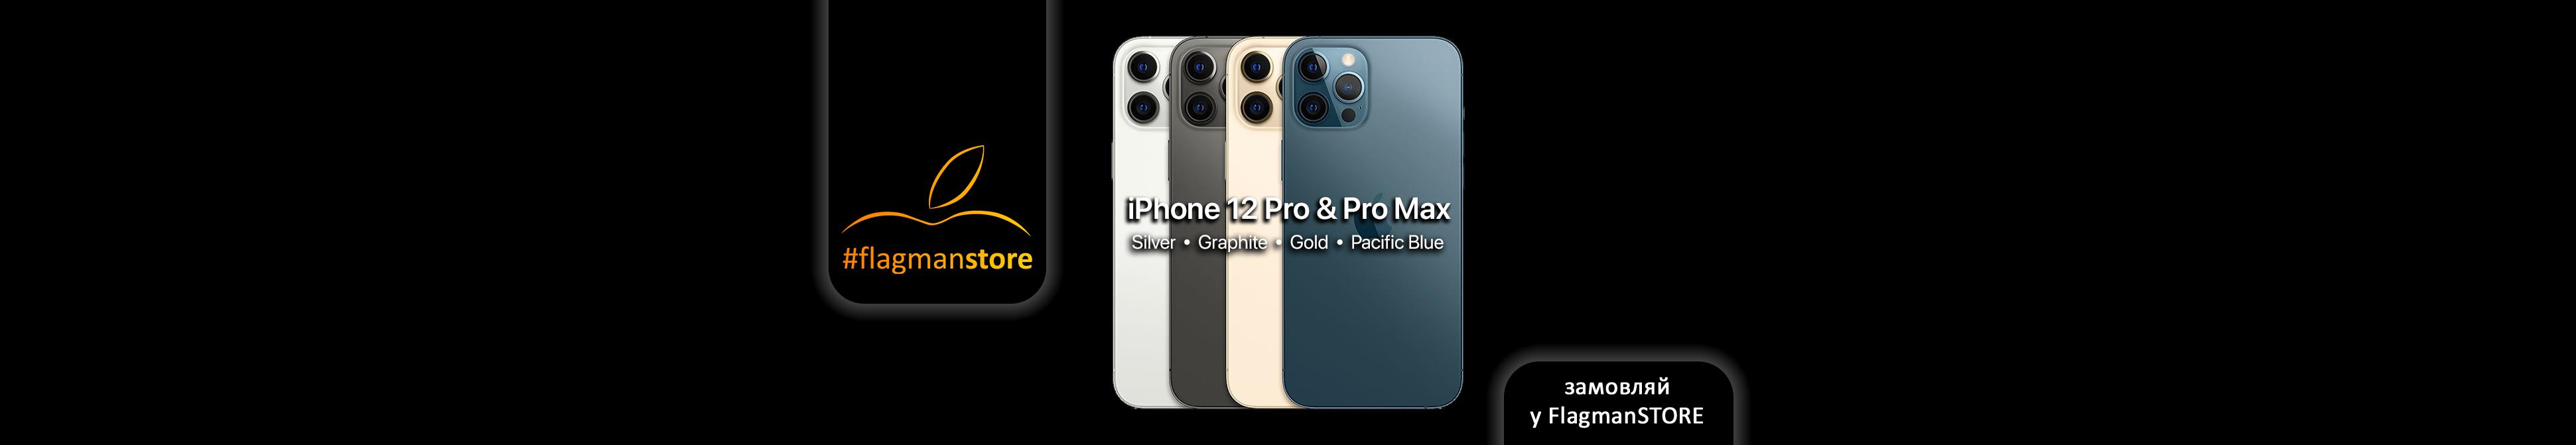 zastavkiiphone12_pro_max_2020